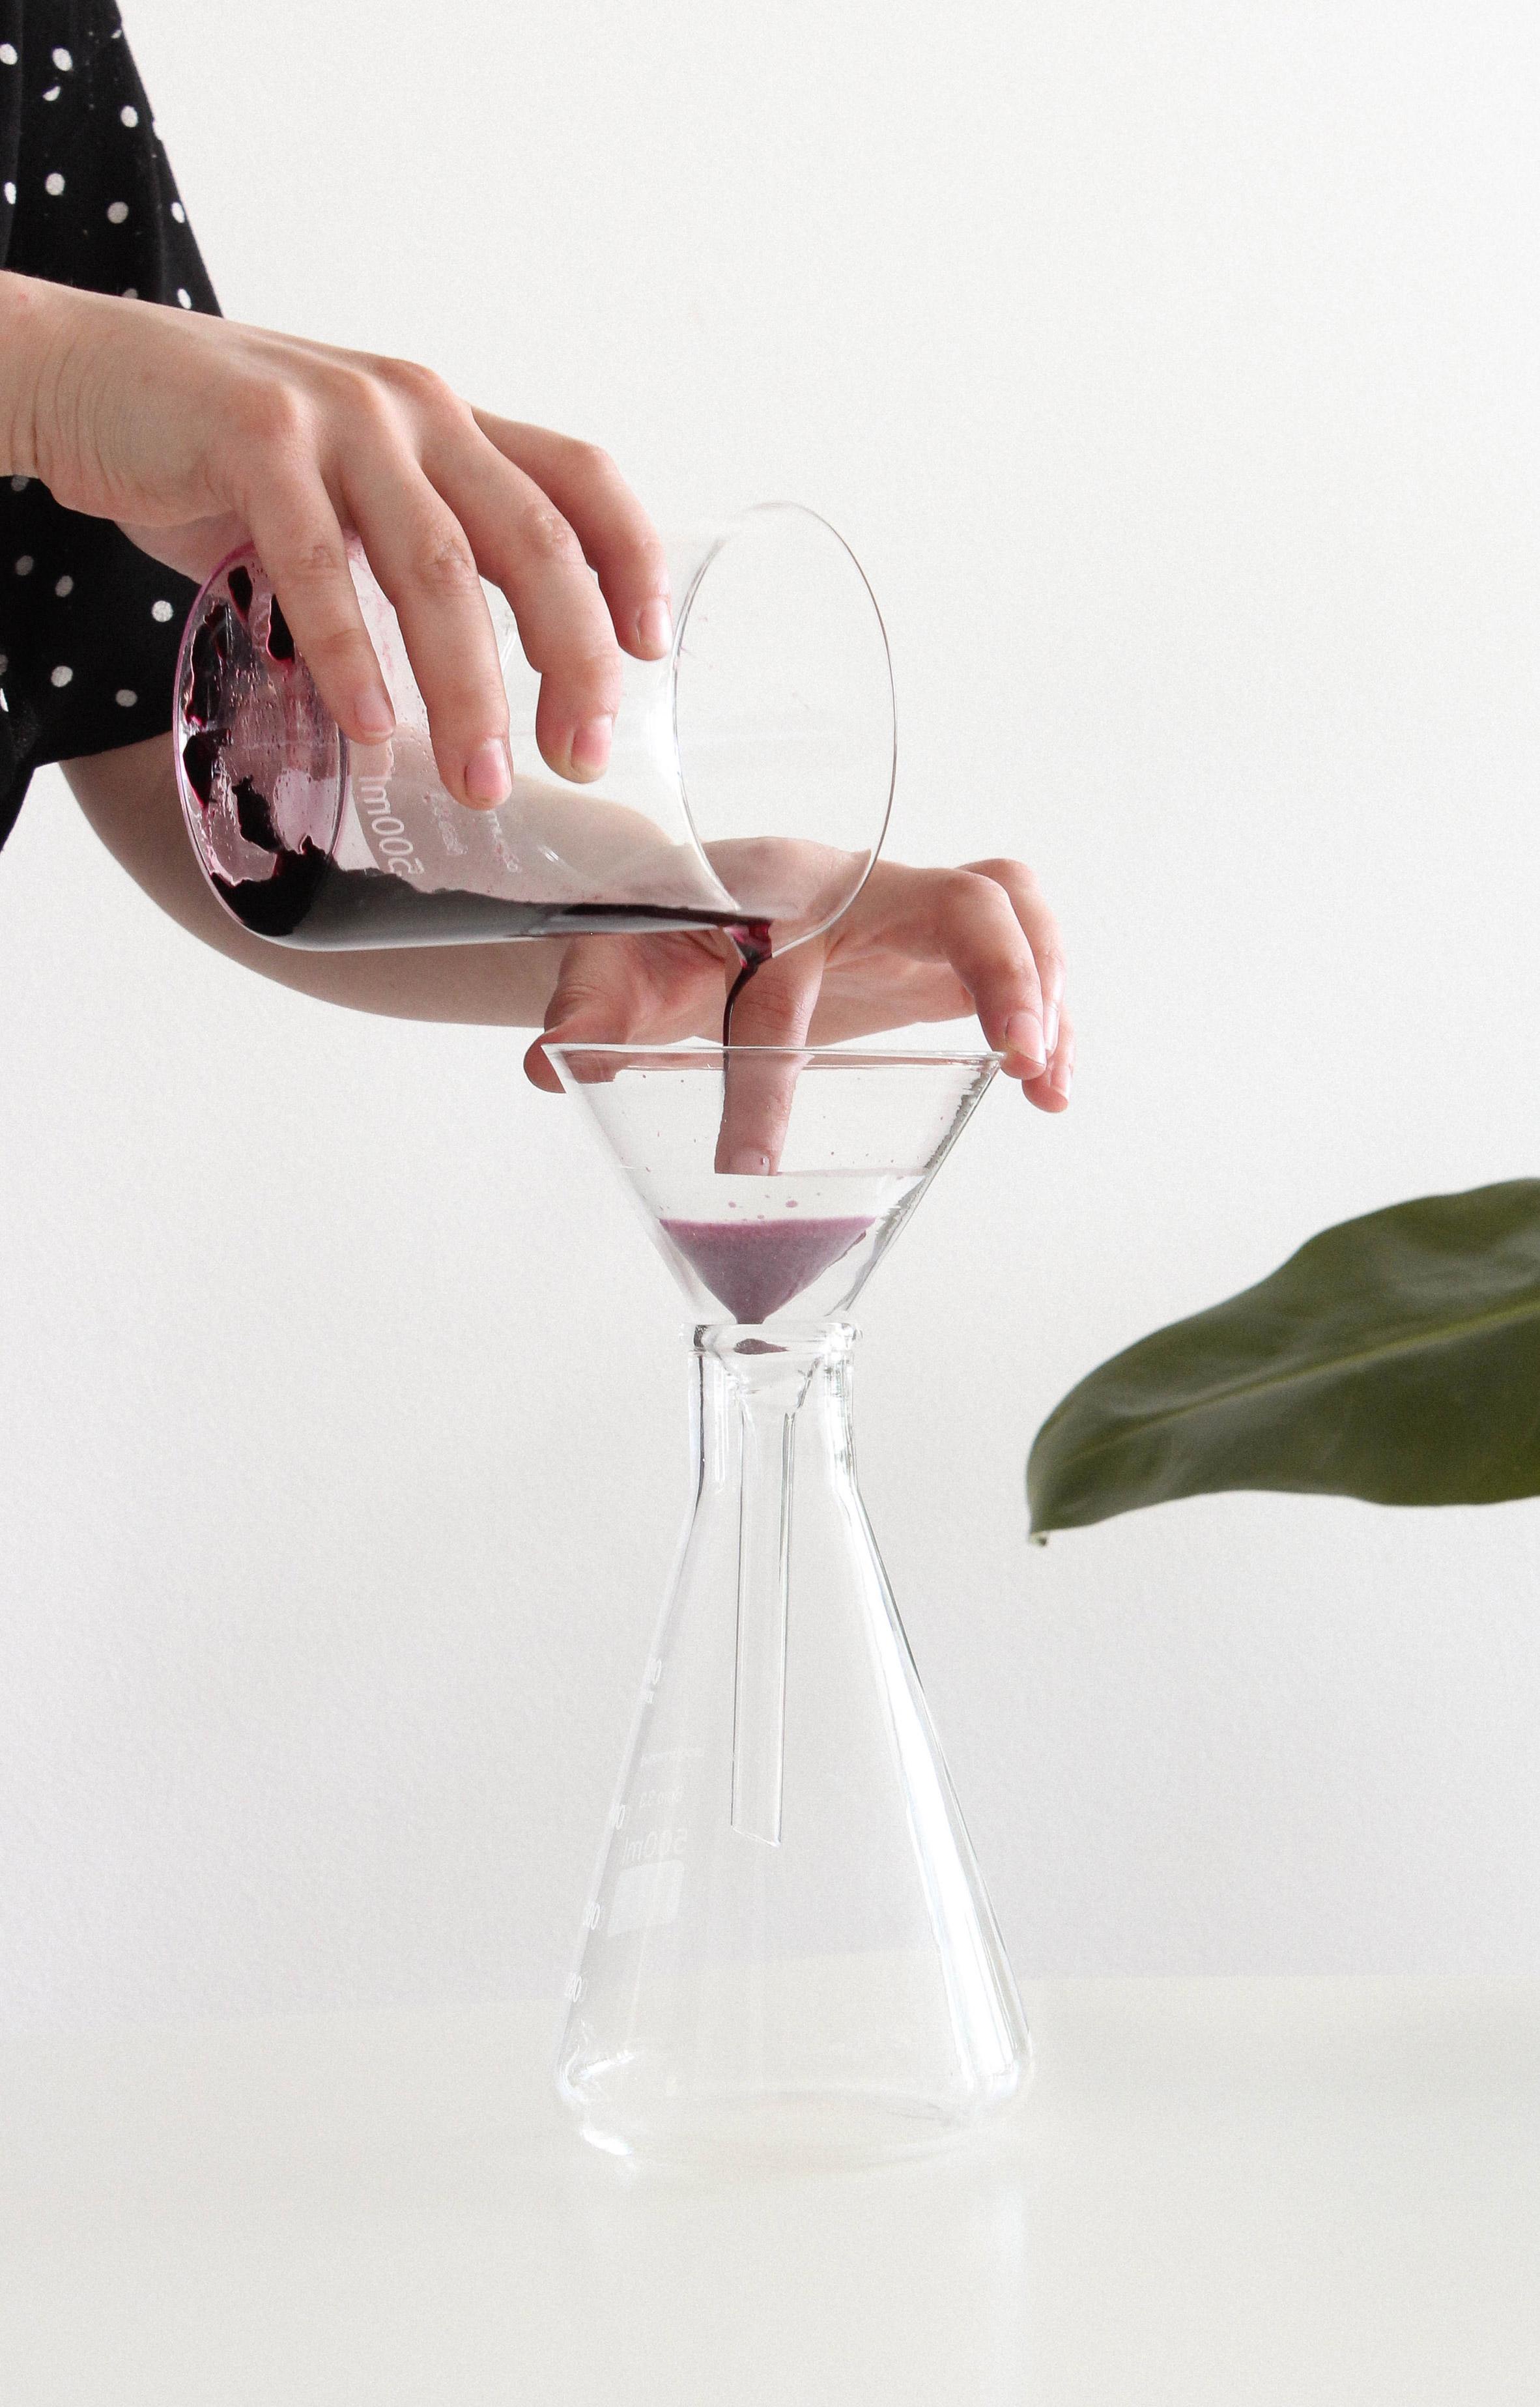 Margarita Talep process to create a bioplastic made from algae